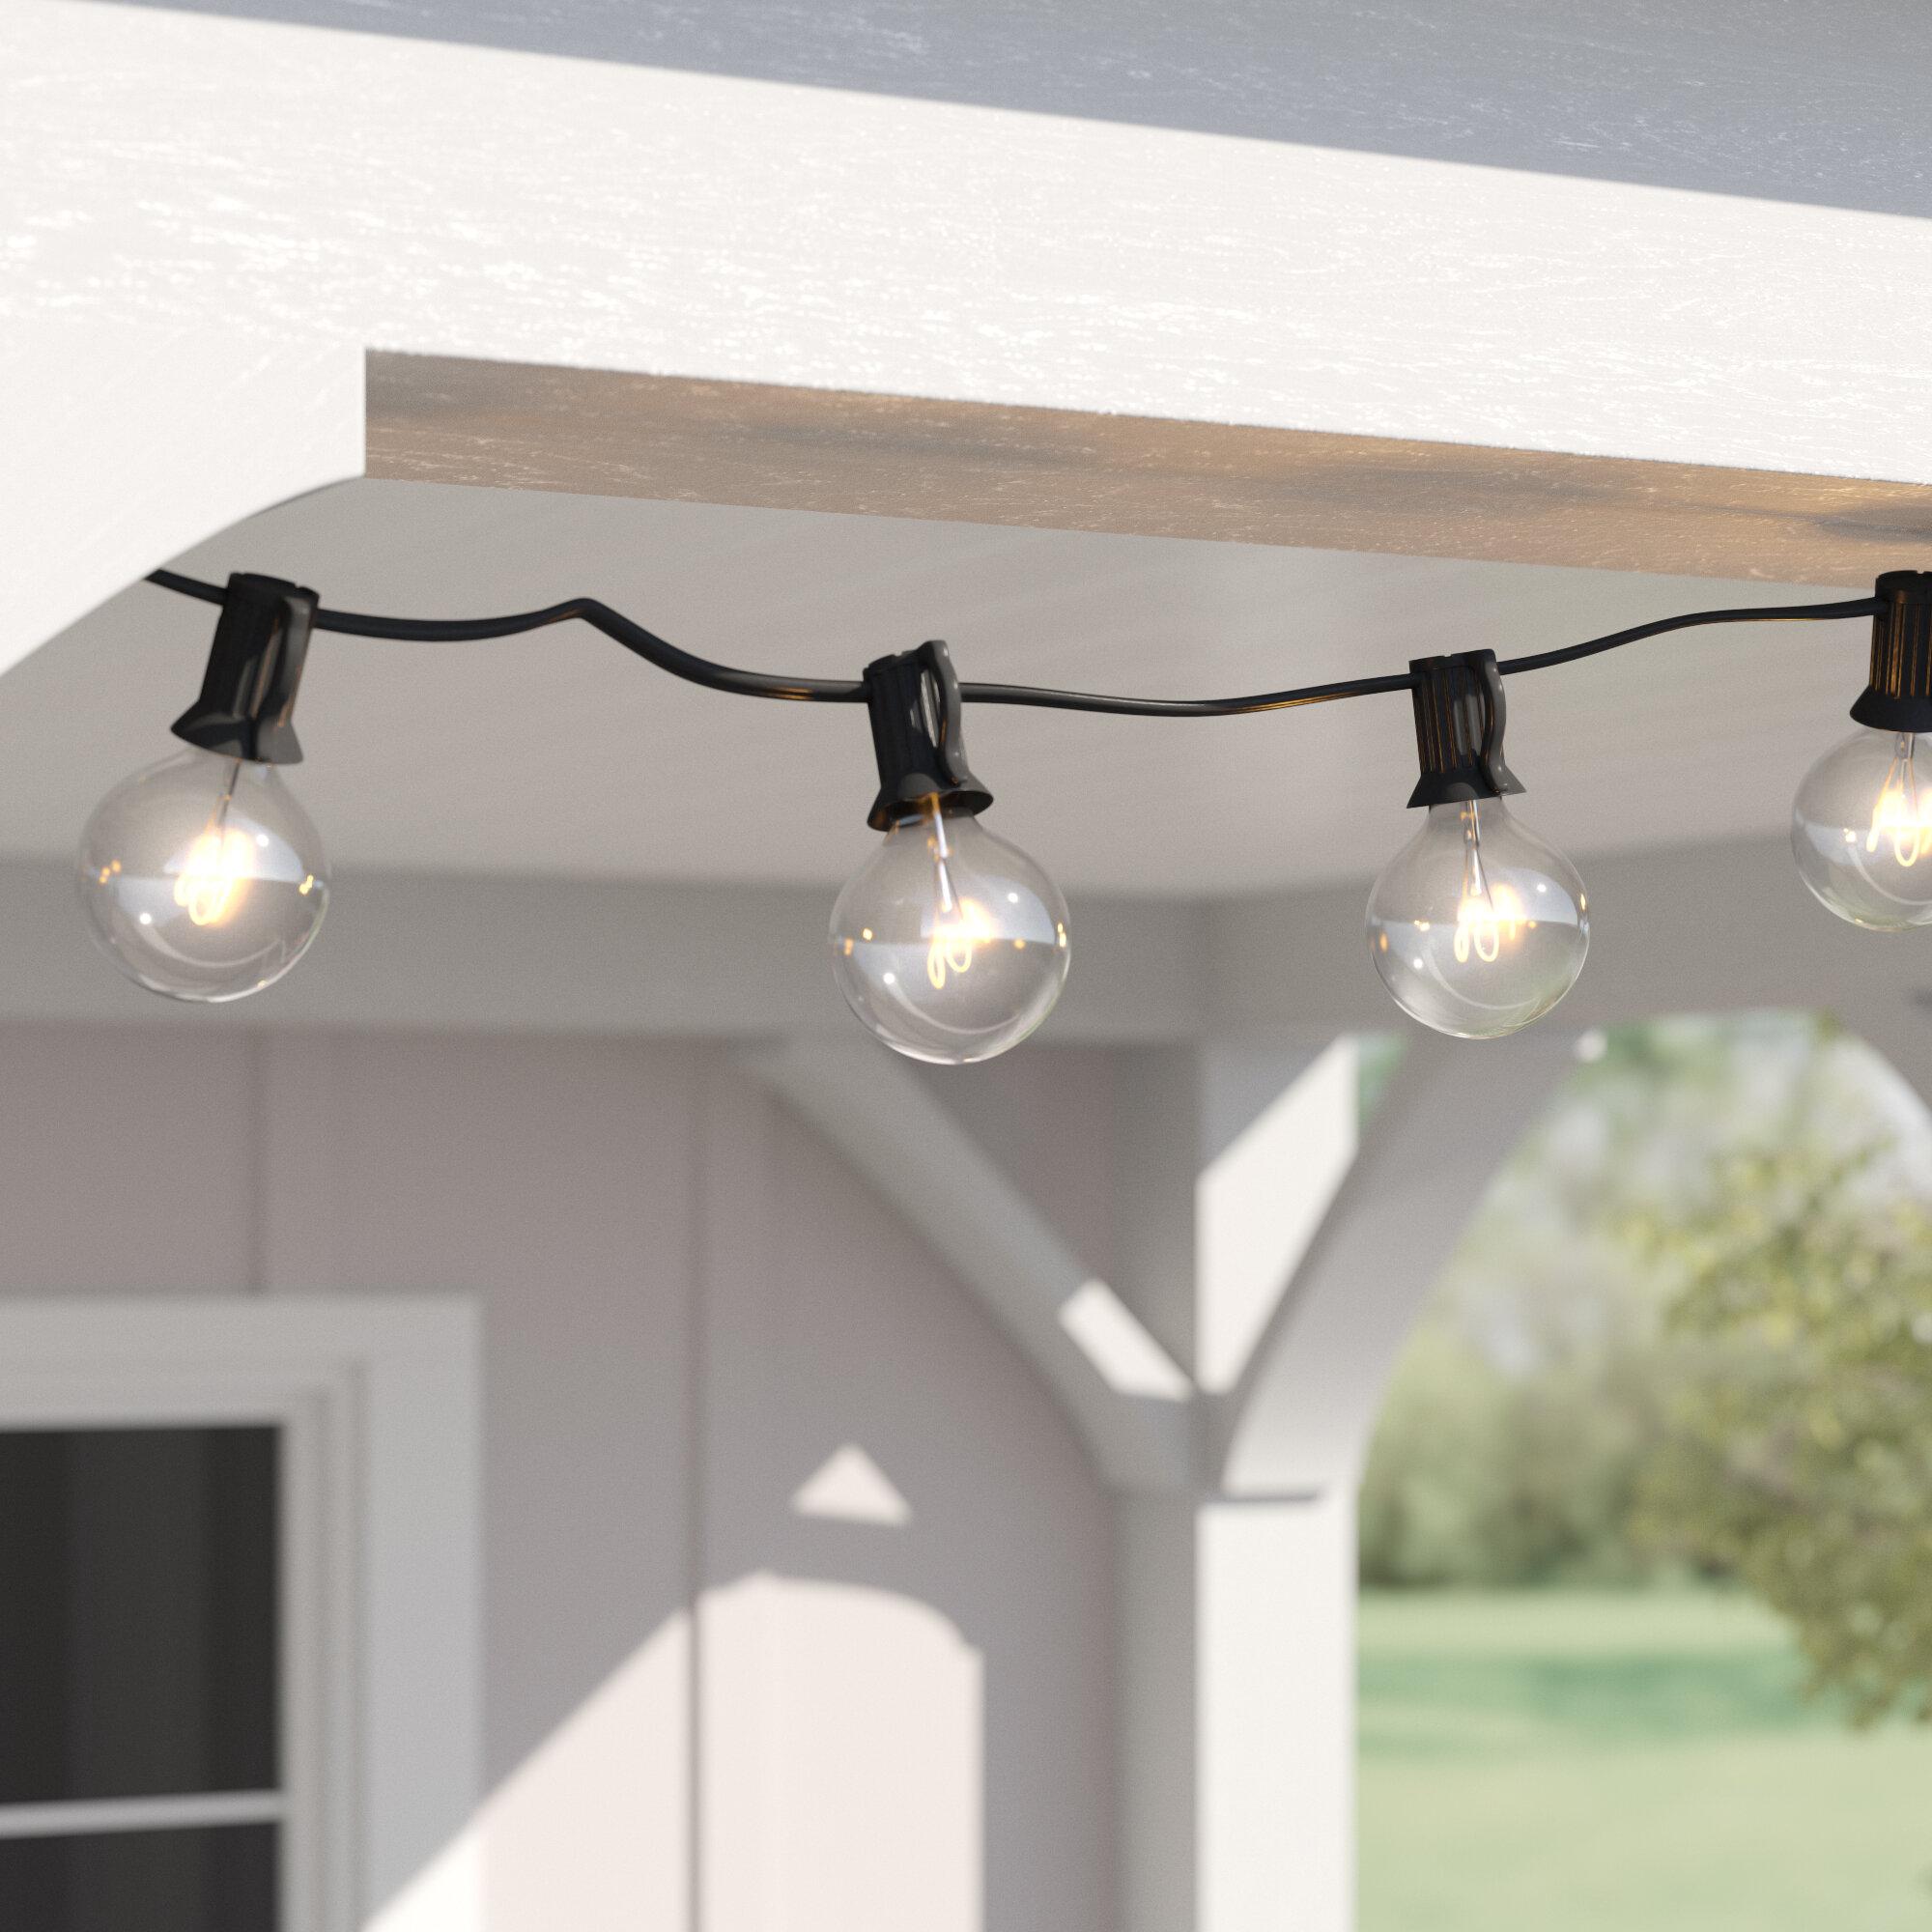 50 LED String Lights Outdoor Indoor Decor Room Tree Ceiling Lights